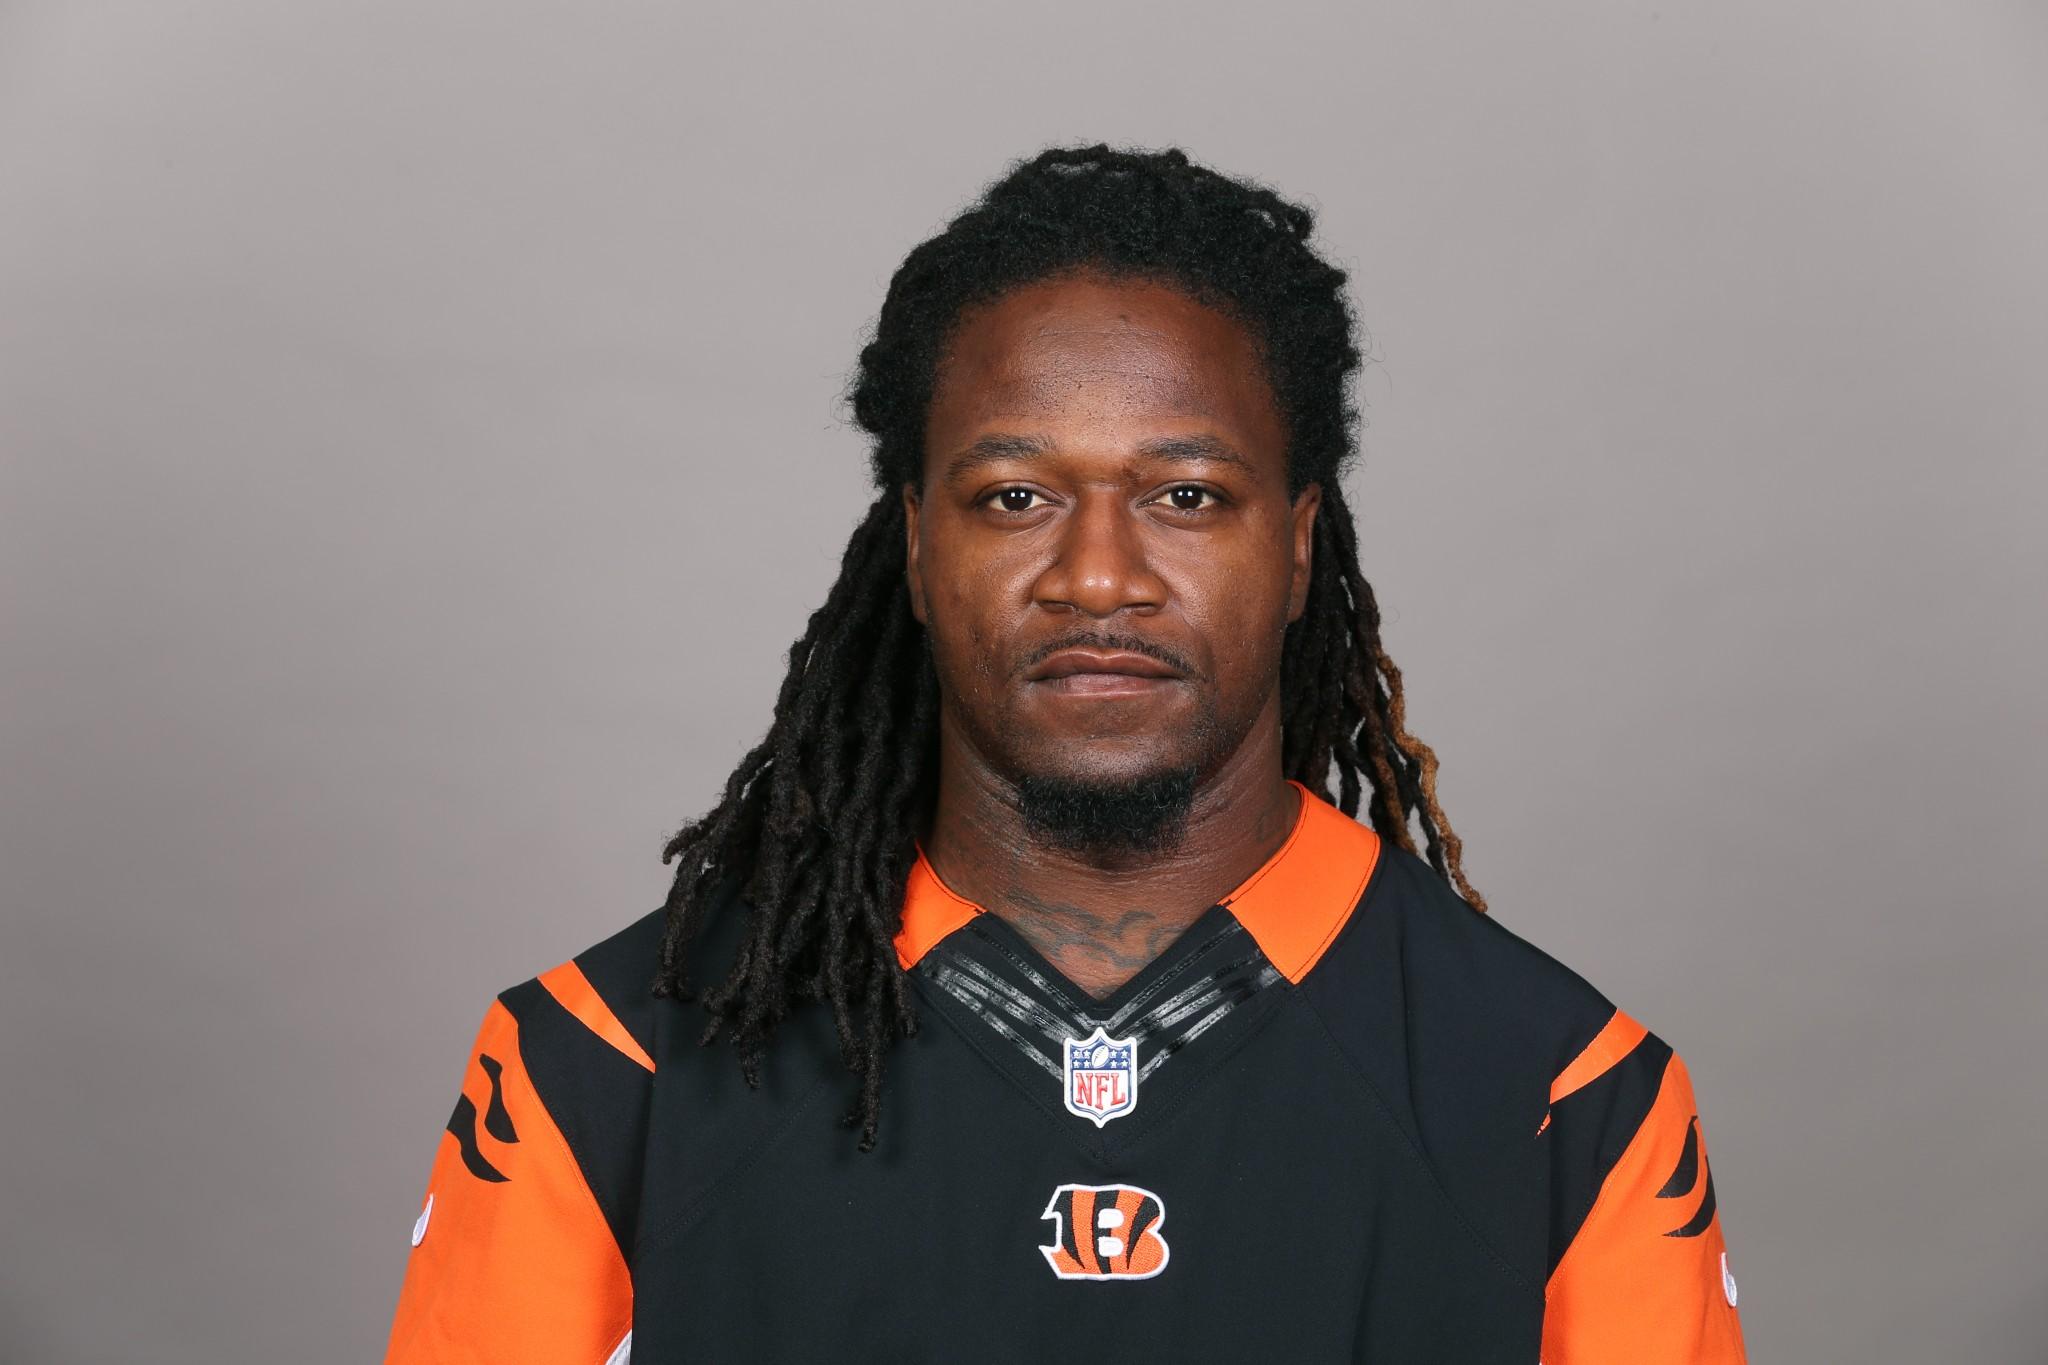 The NFL has suspended Cincinnati CB Adam Jones for the regular-season opener. (AP)